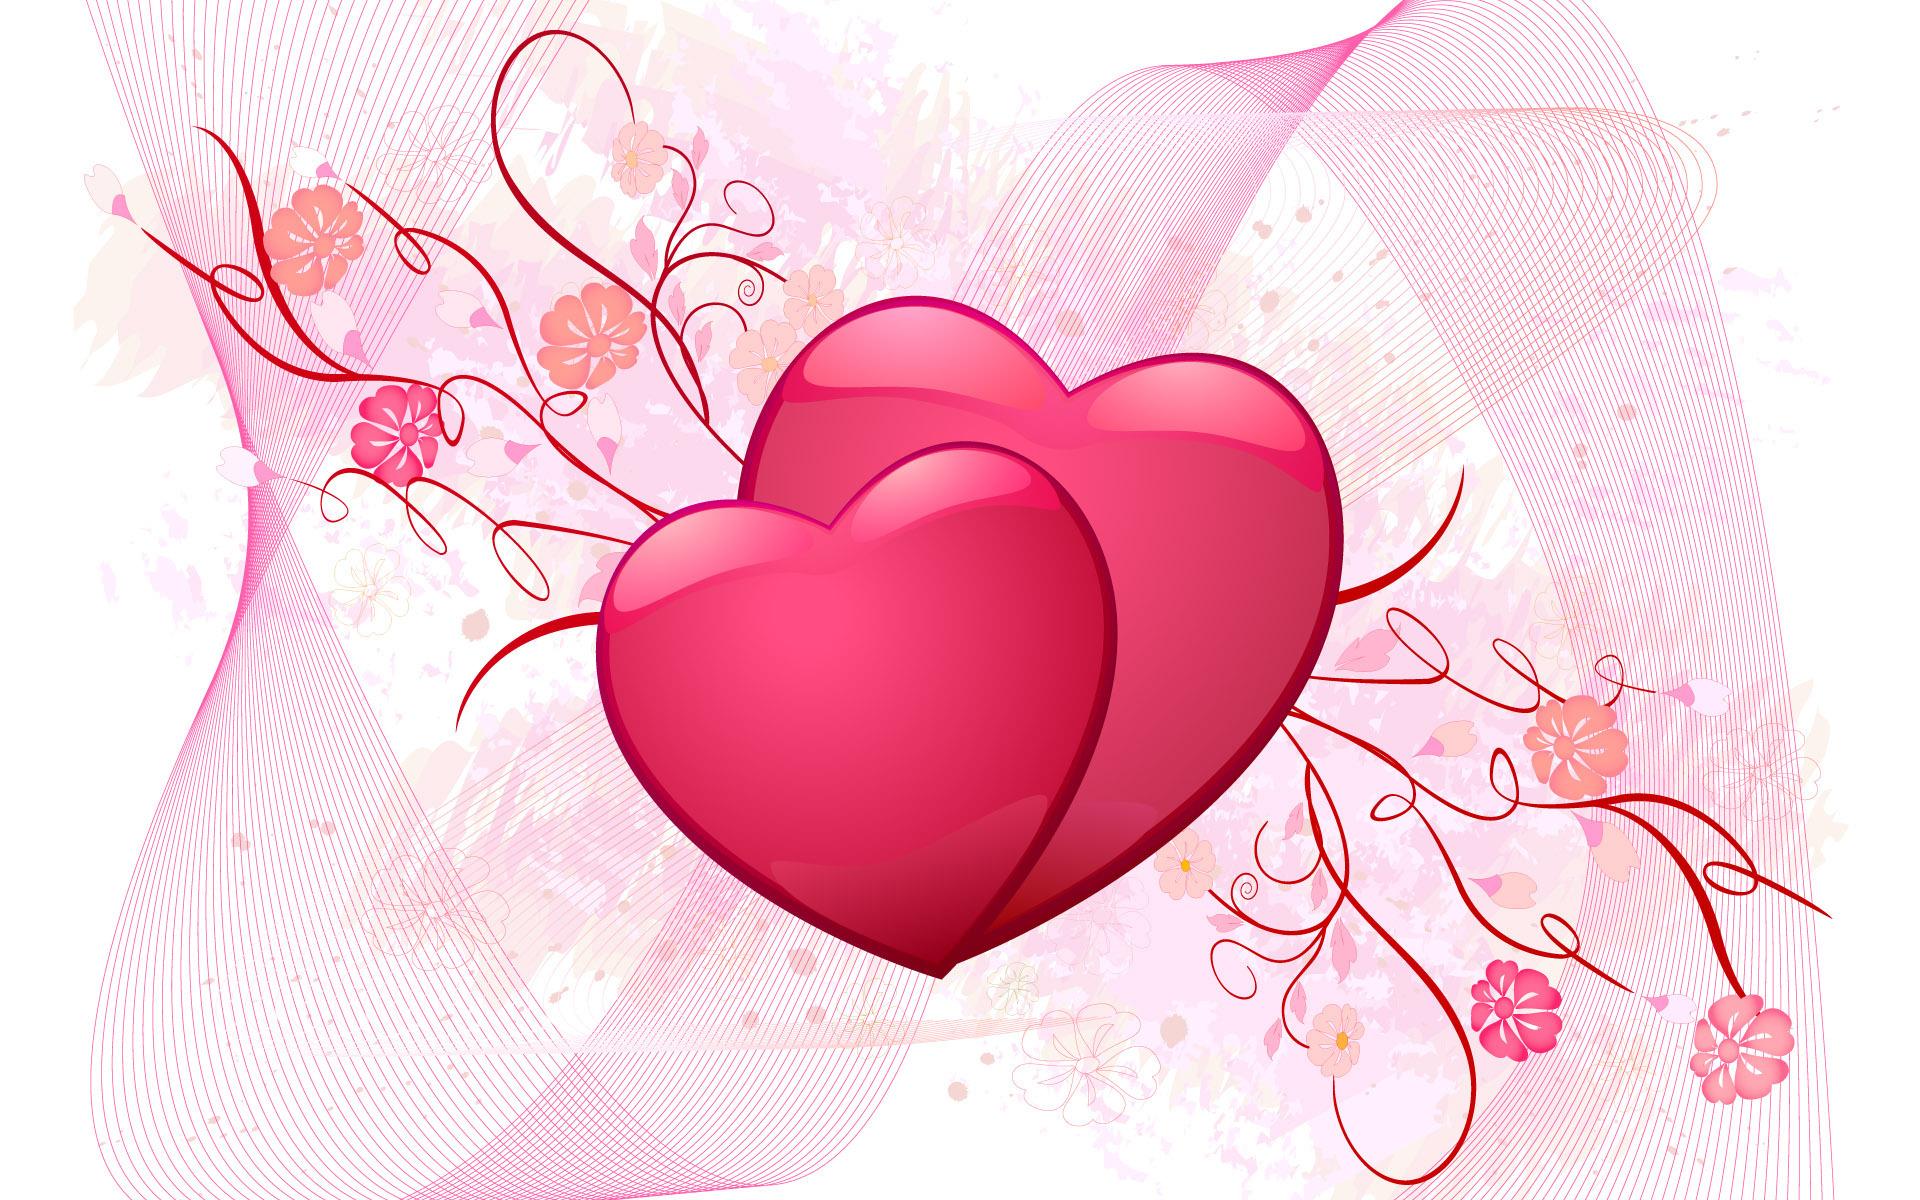 Love wallpaper   Love Wallpaper 4187609 1920x1200